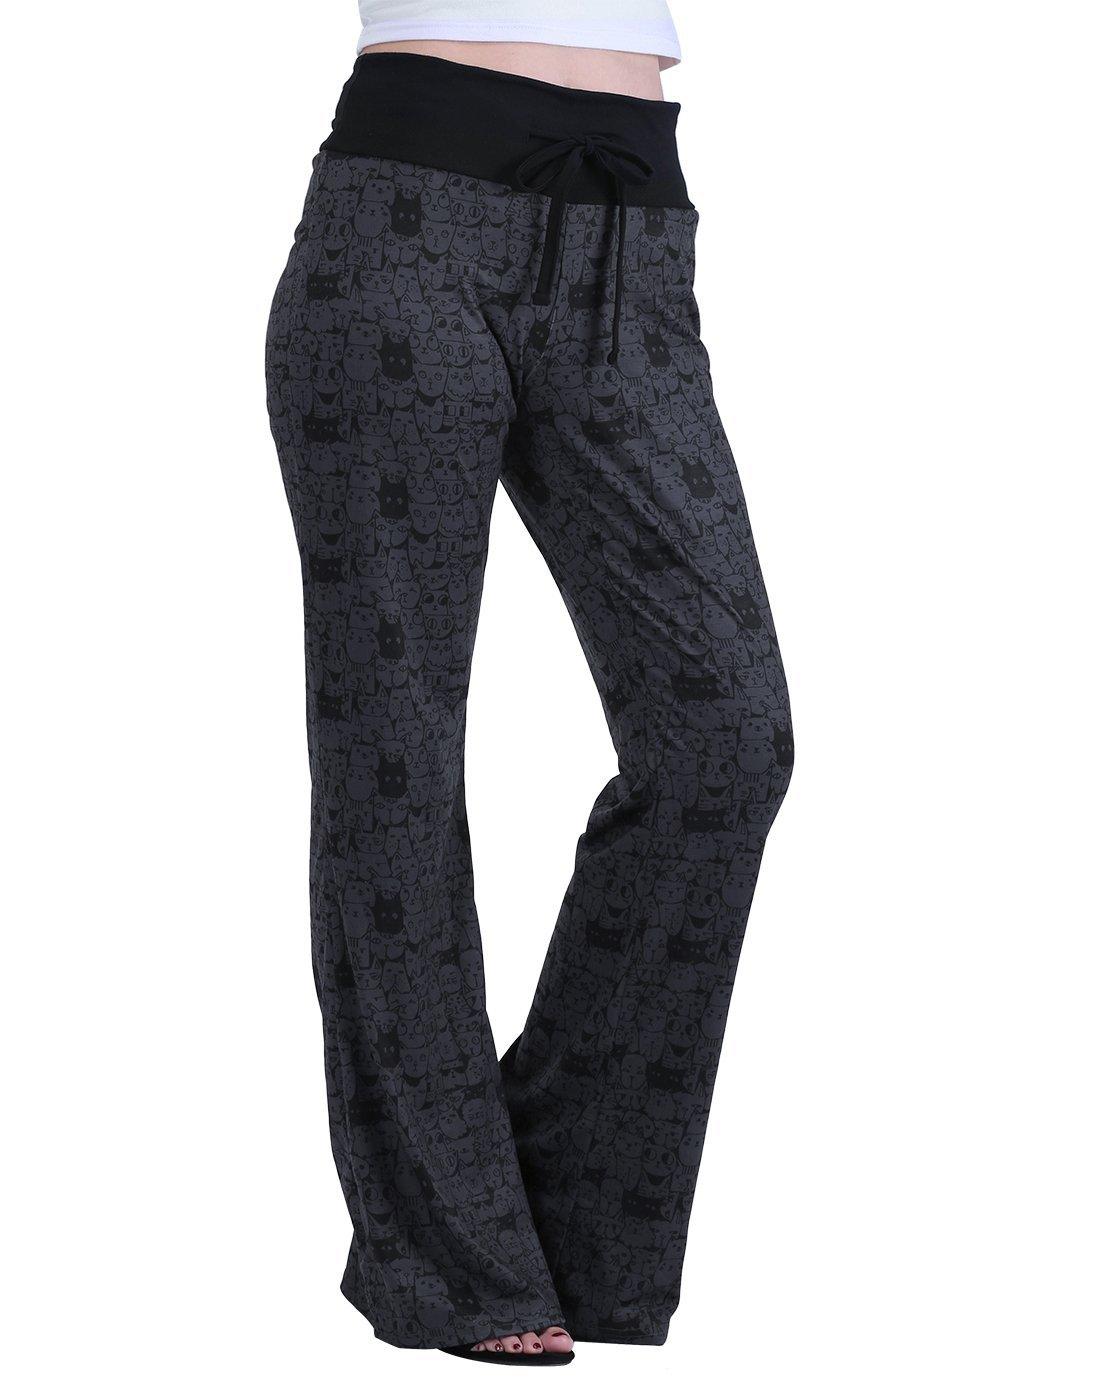 HDE Womens Cotton Pajama Pants Wide Leg Sleepwear Casual Loose Lounge PJ Bottoms,A Thousand Cats,Large